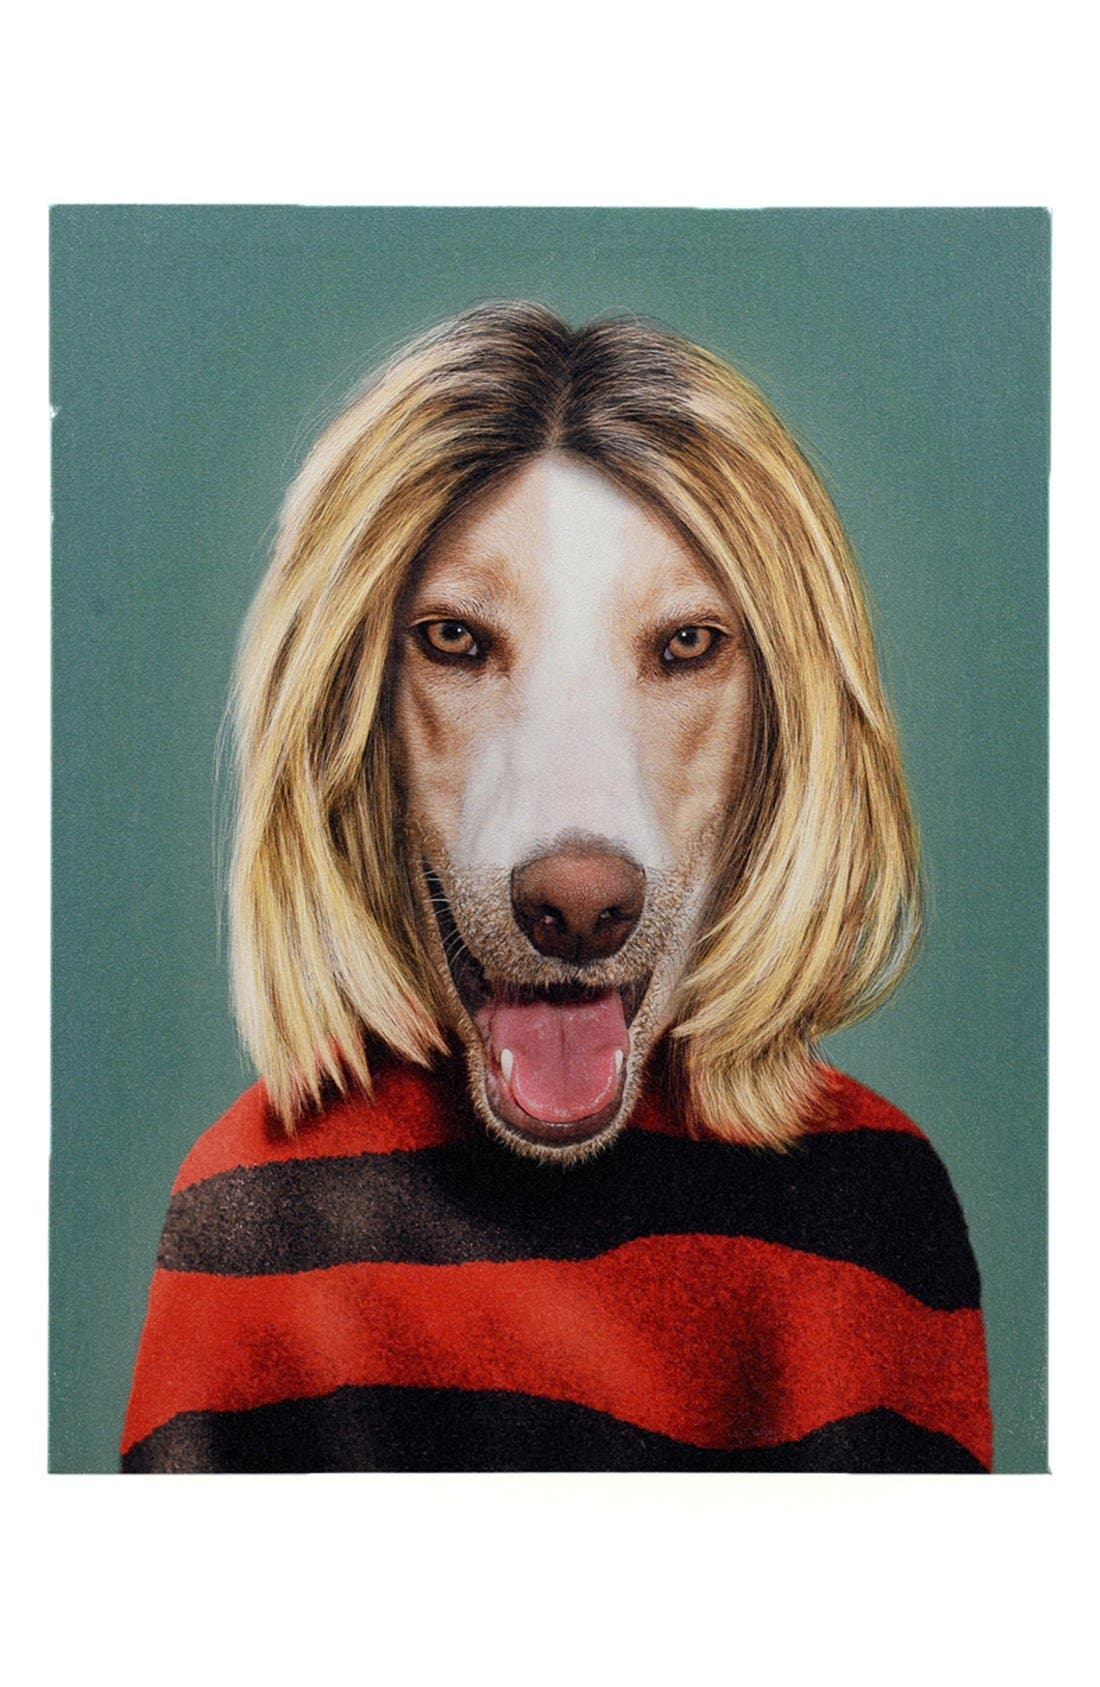 Alternate Image 1 Selected - Empire Art Direct 'Pets Rock™ - Grunge' Giclée Wall Art